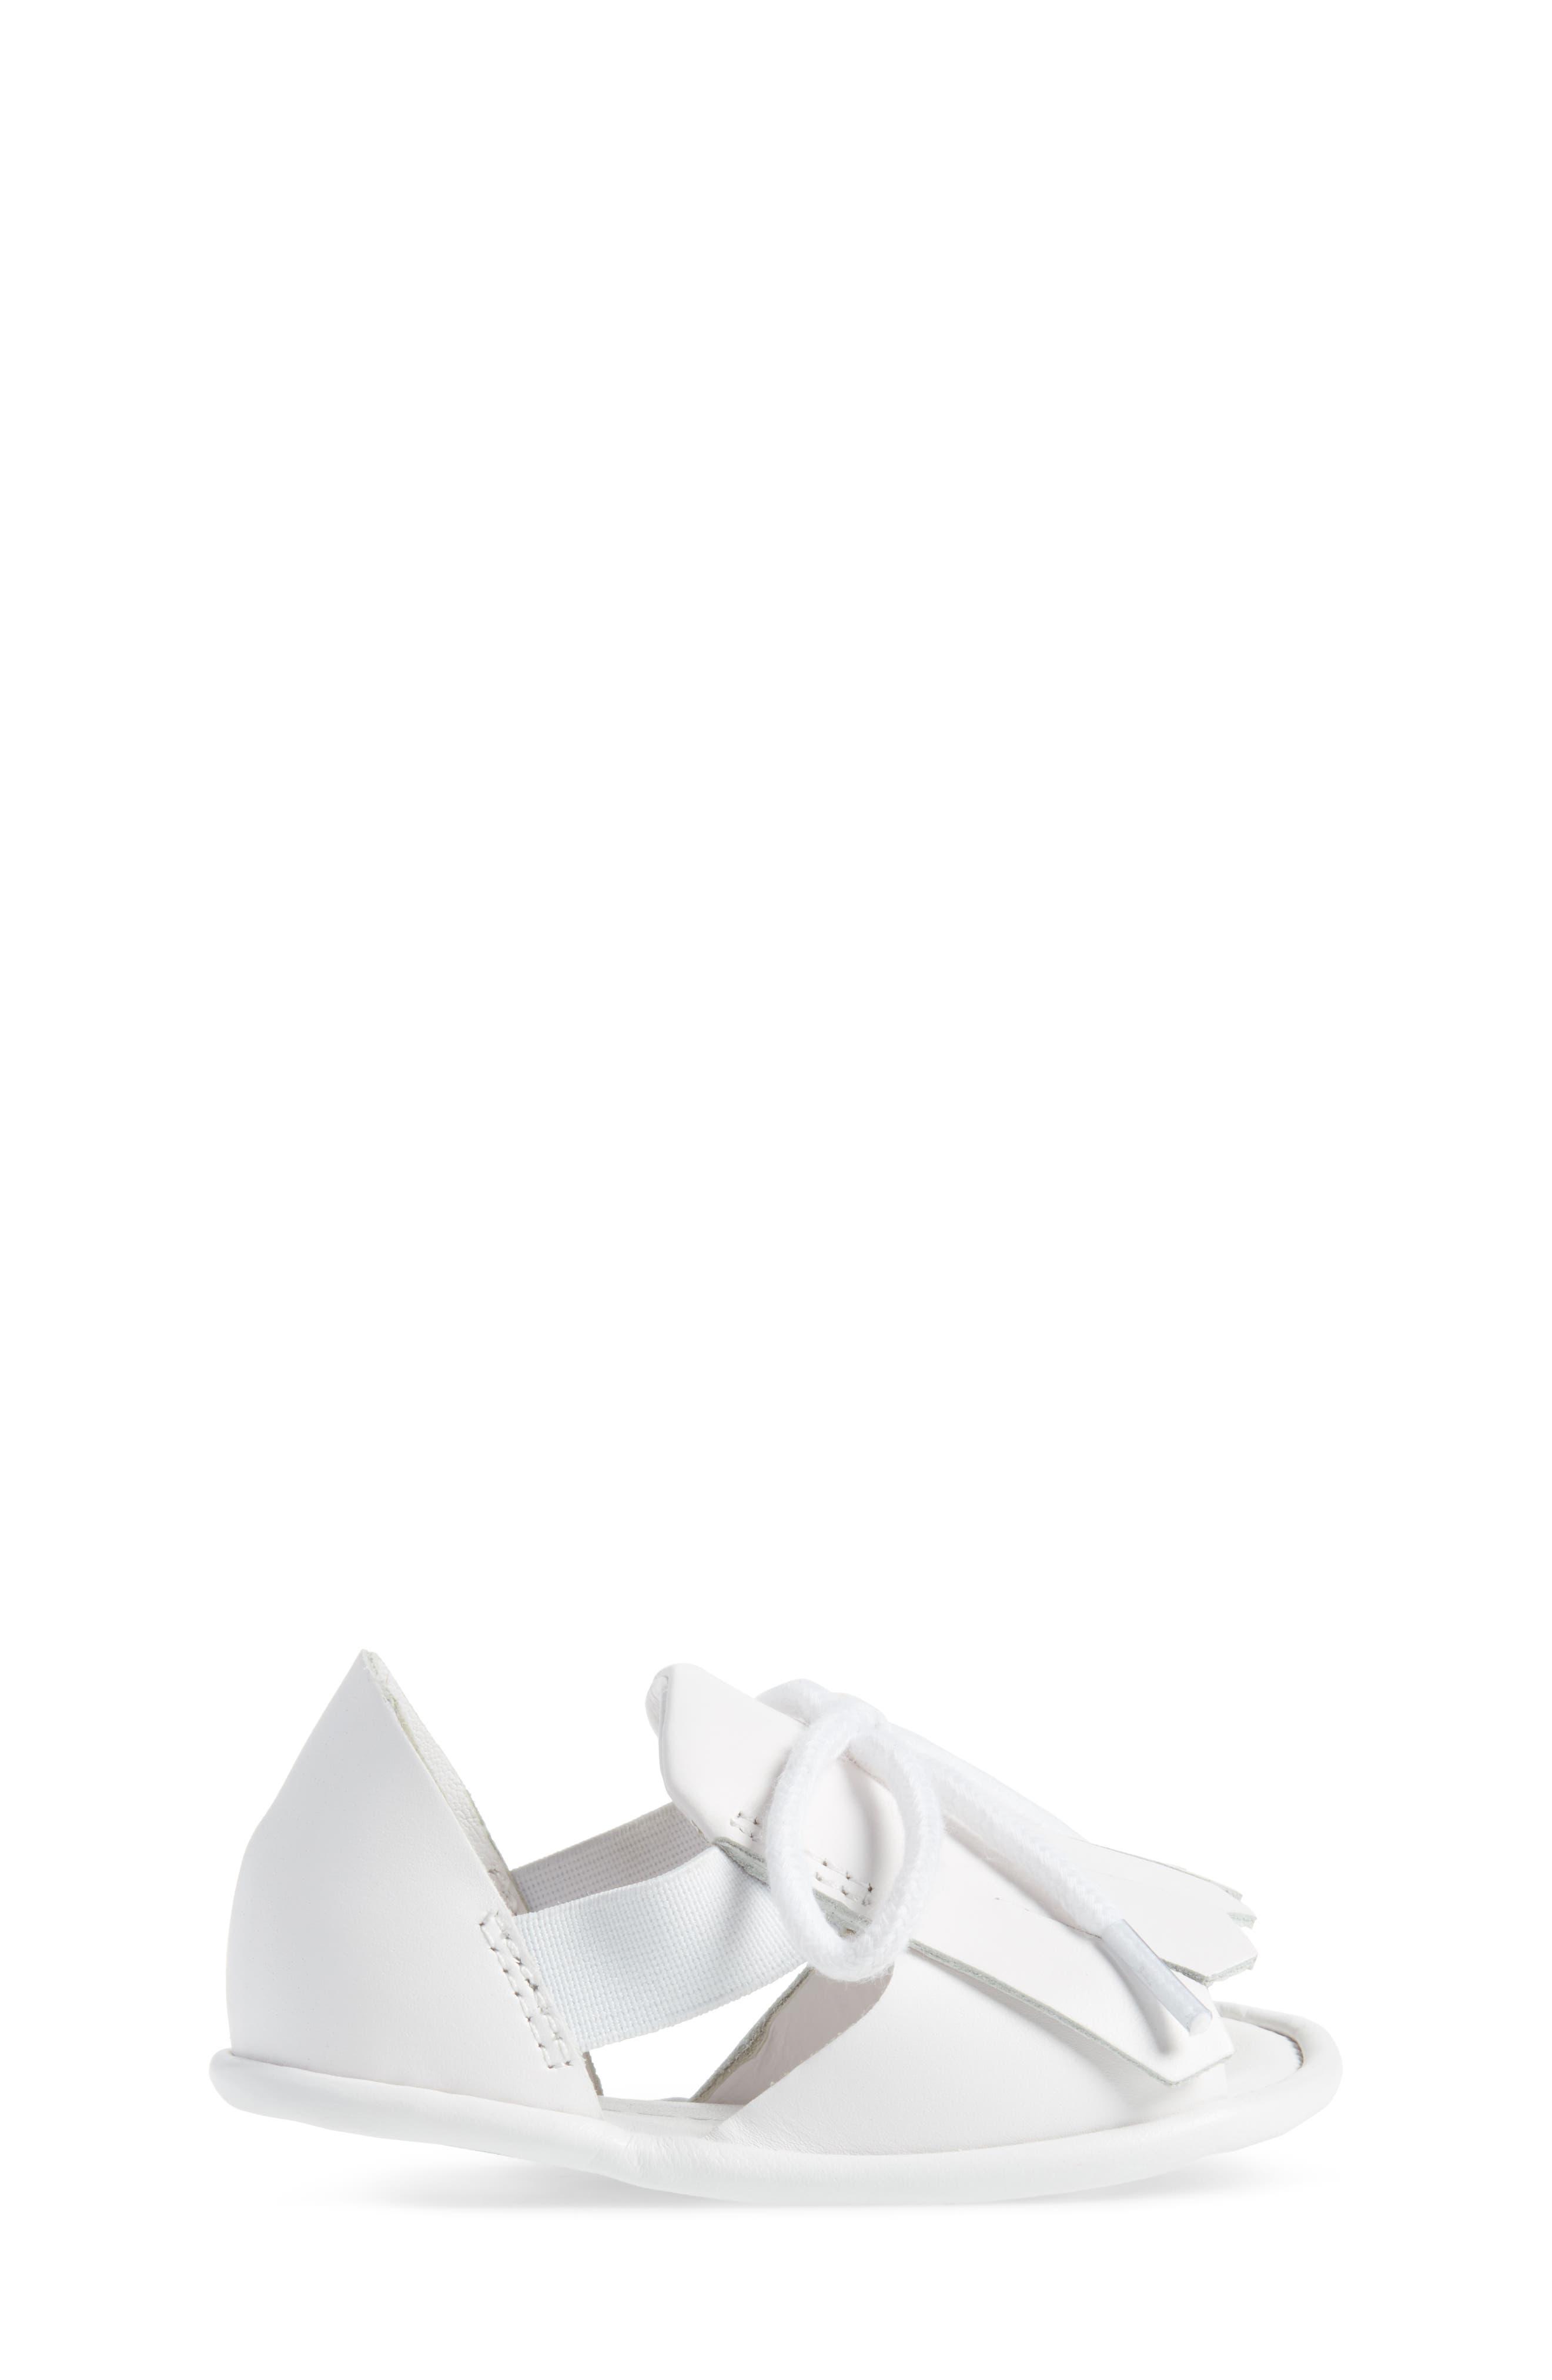 New Dawny Kiltie Fringe Crib Sandal,                             Alternate thumbnail 3, color,                             Optic White